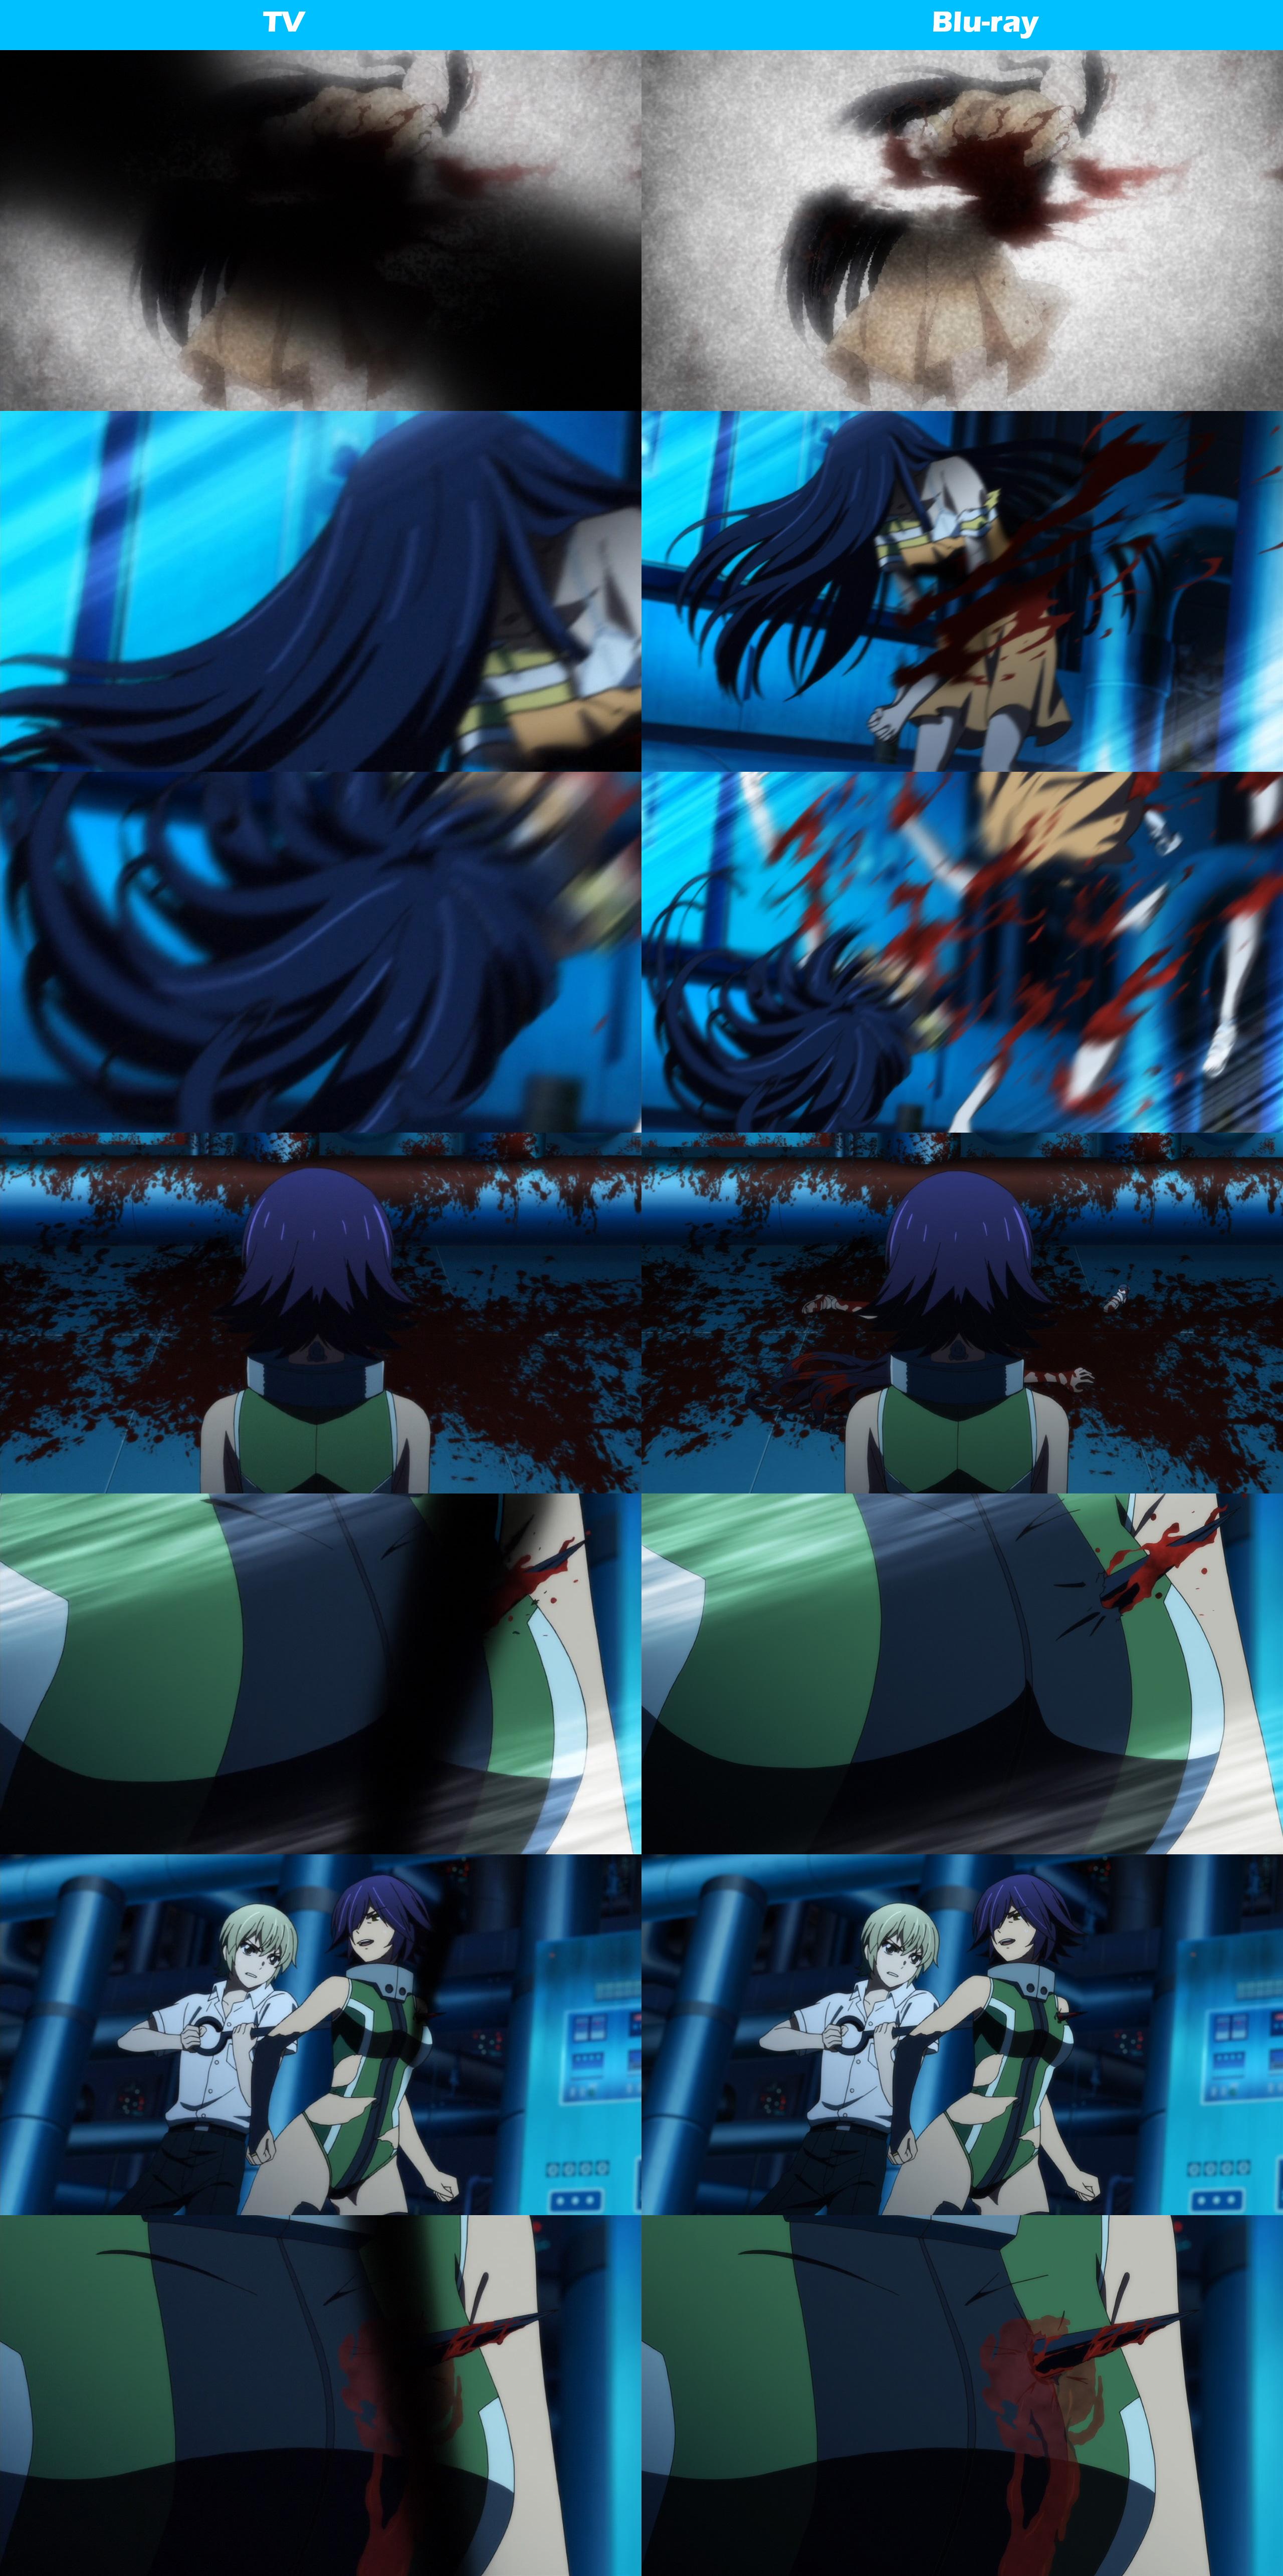 Gokukoku-no-Brynhildr-TV-and-Blu-ray-Comparisons-Gore-1_Haruhichan.com